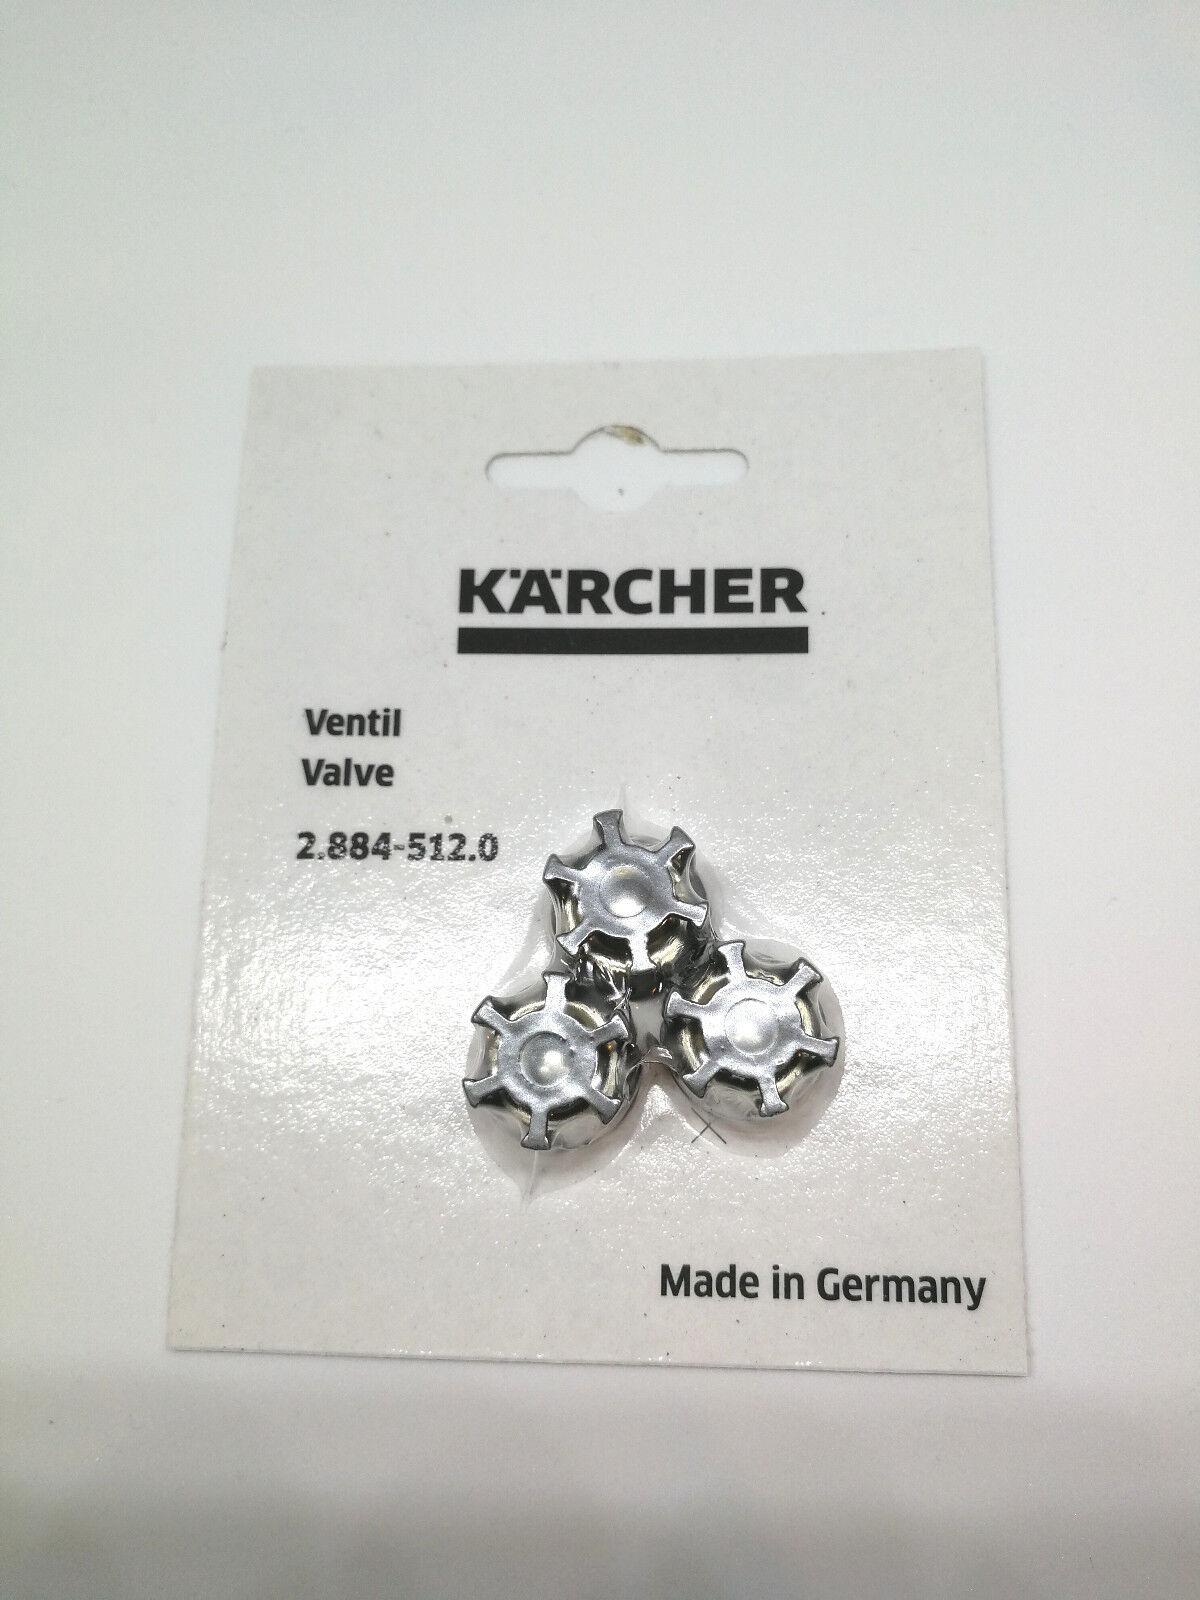 Valves Valve kit for 22mm Piston 6 pcs for Karcher HDS and HD 995 755 2000